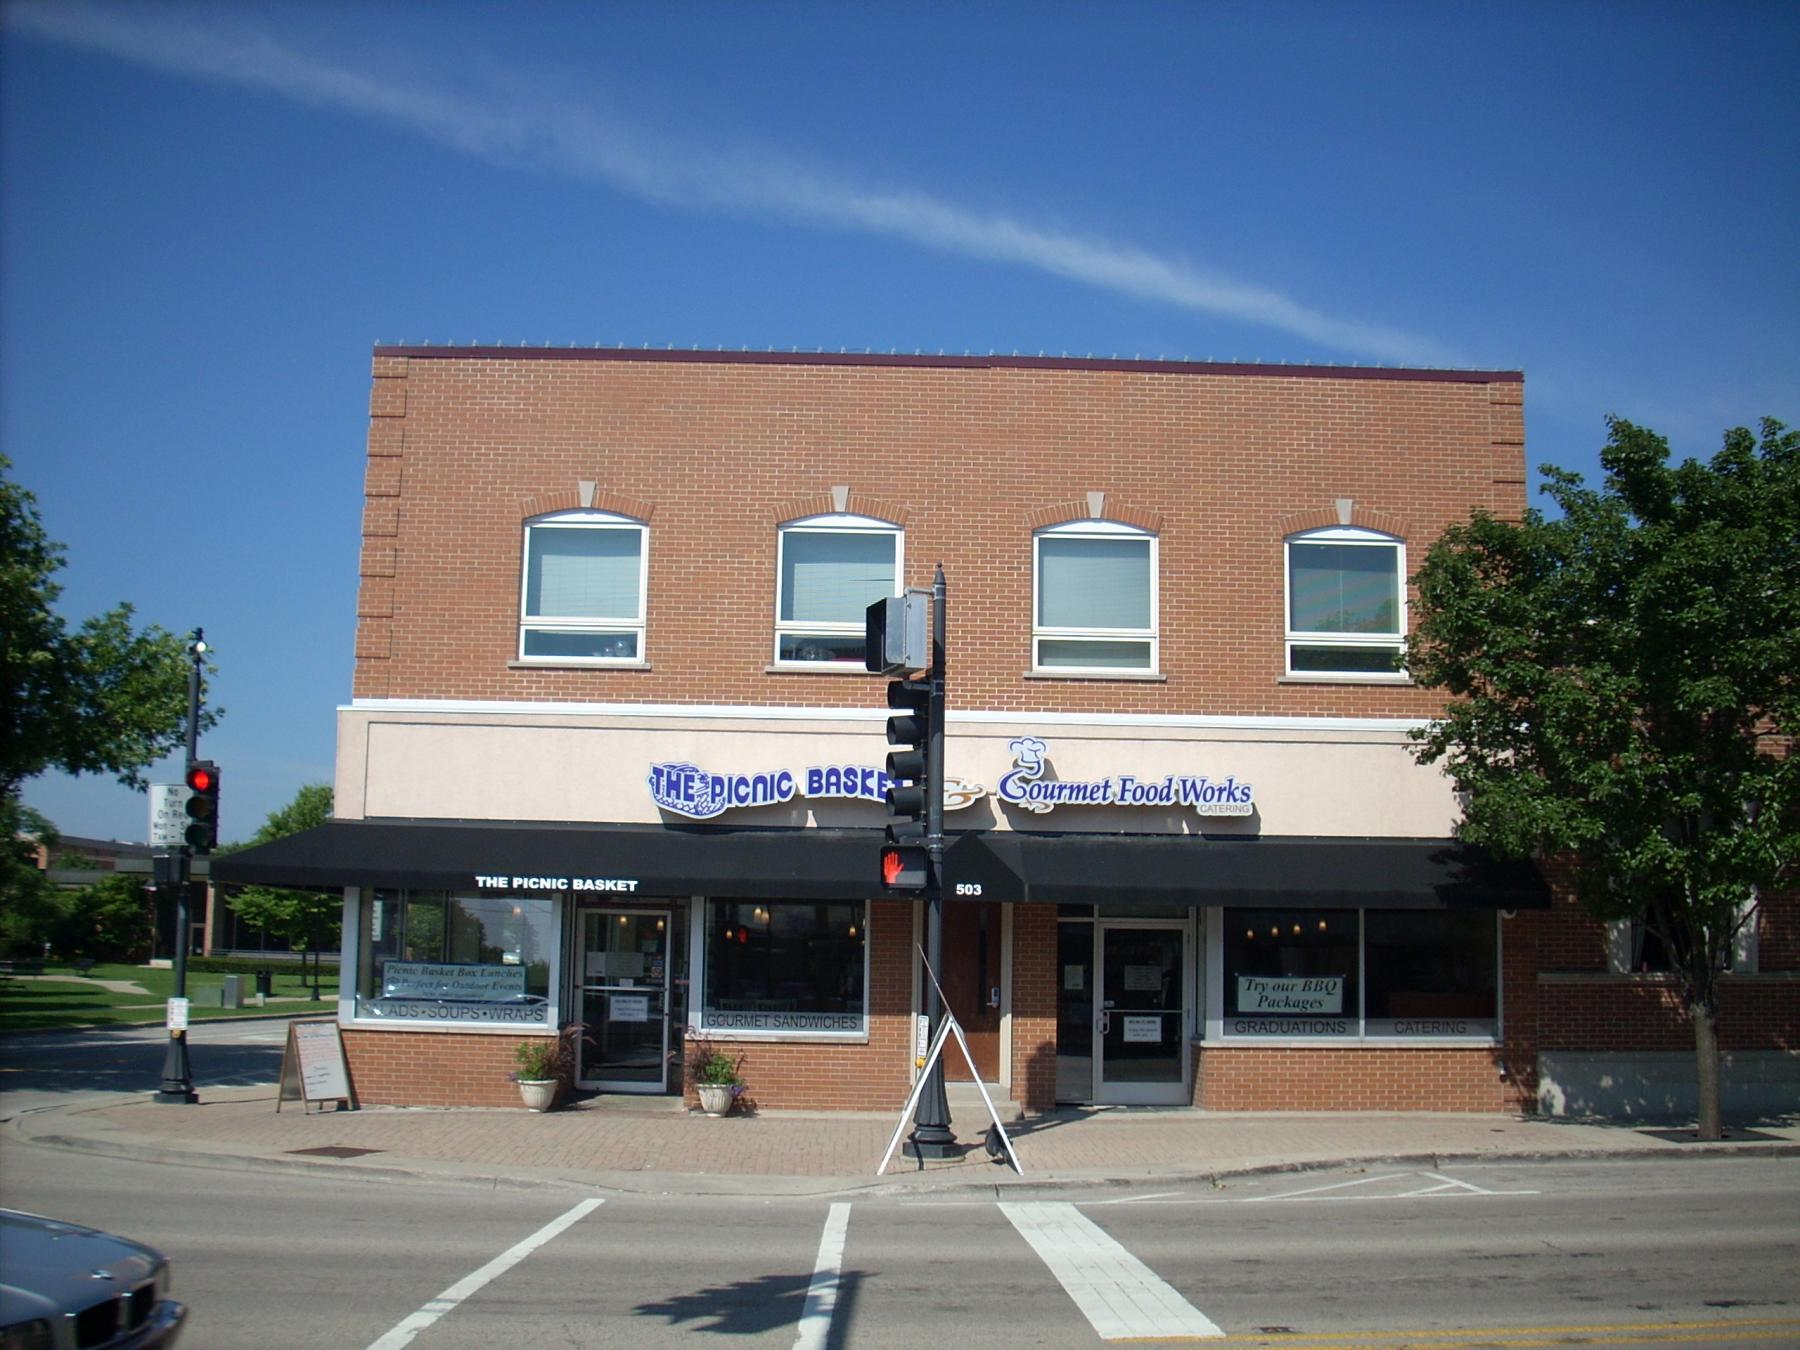 501 - 505 N. Milwaukee Ave, The Picnic Basket Restaurant